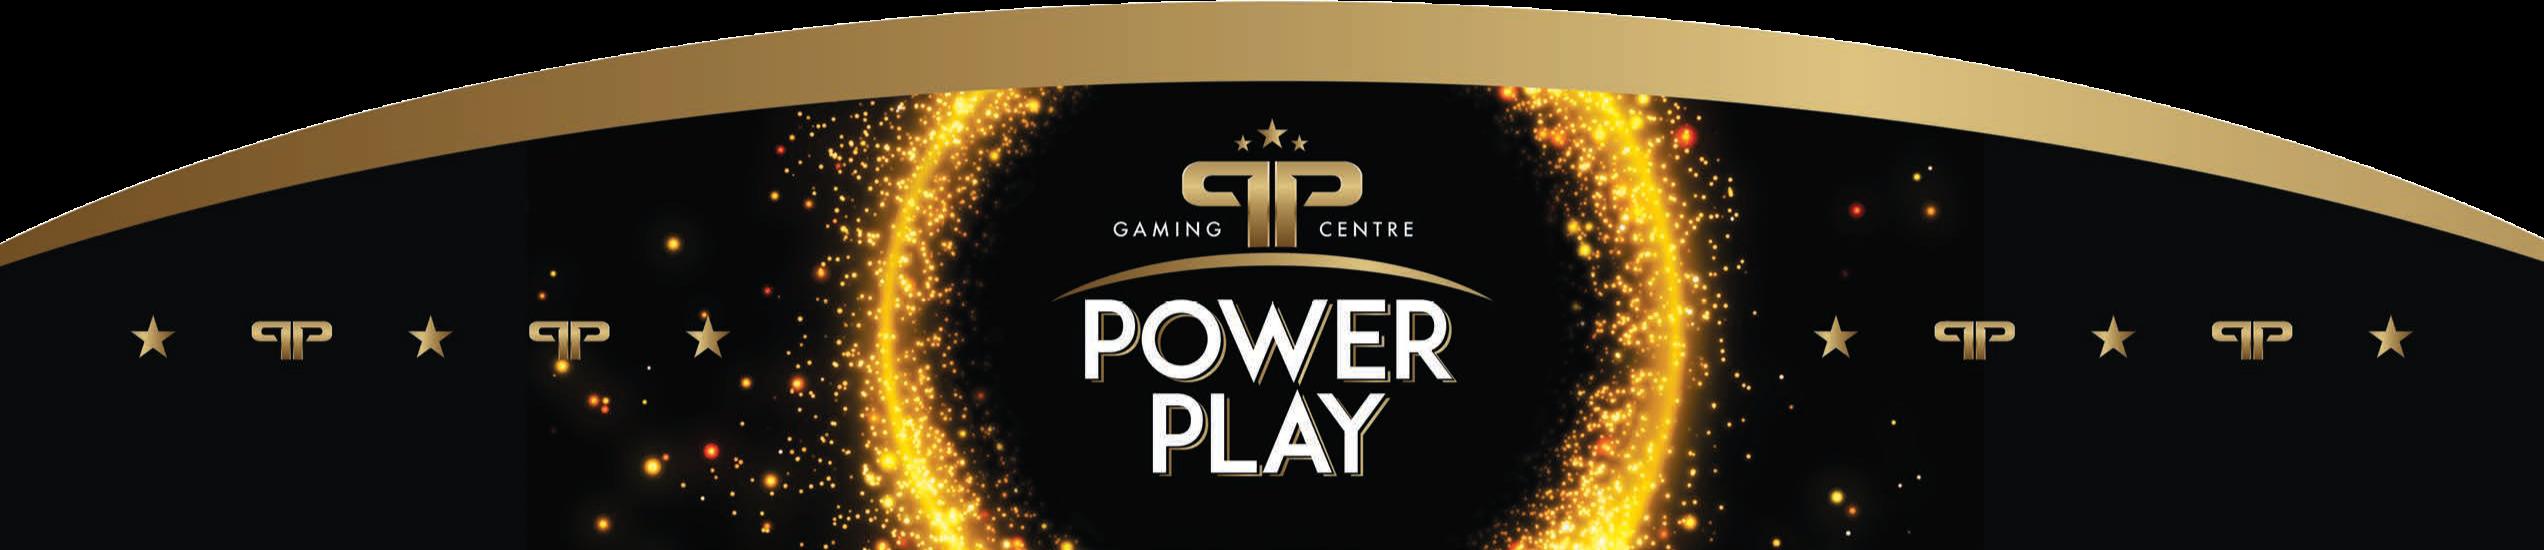 power-play-gaming-centre-windsor-essex-vegas-games